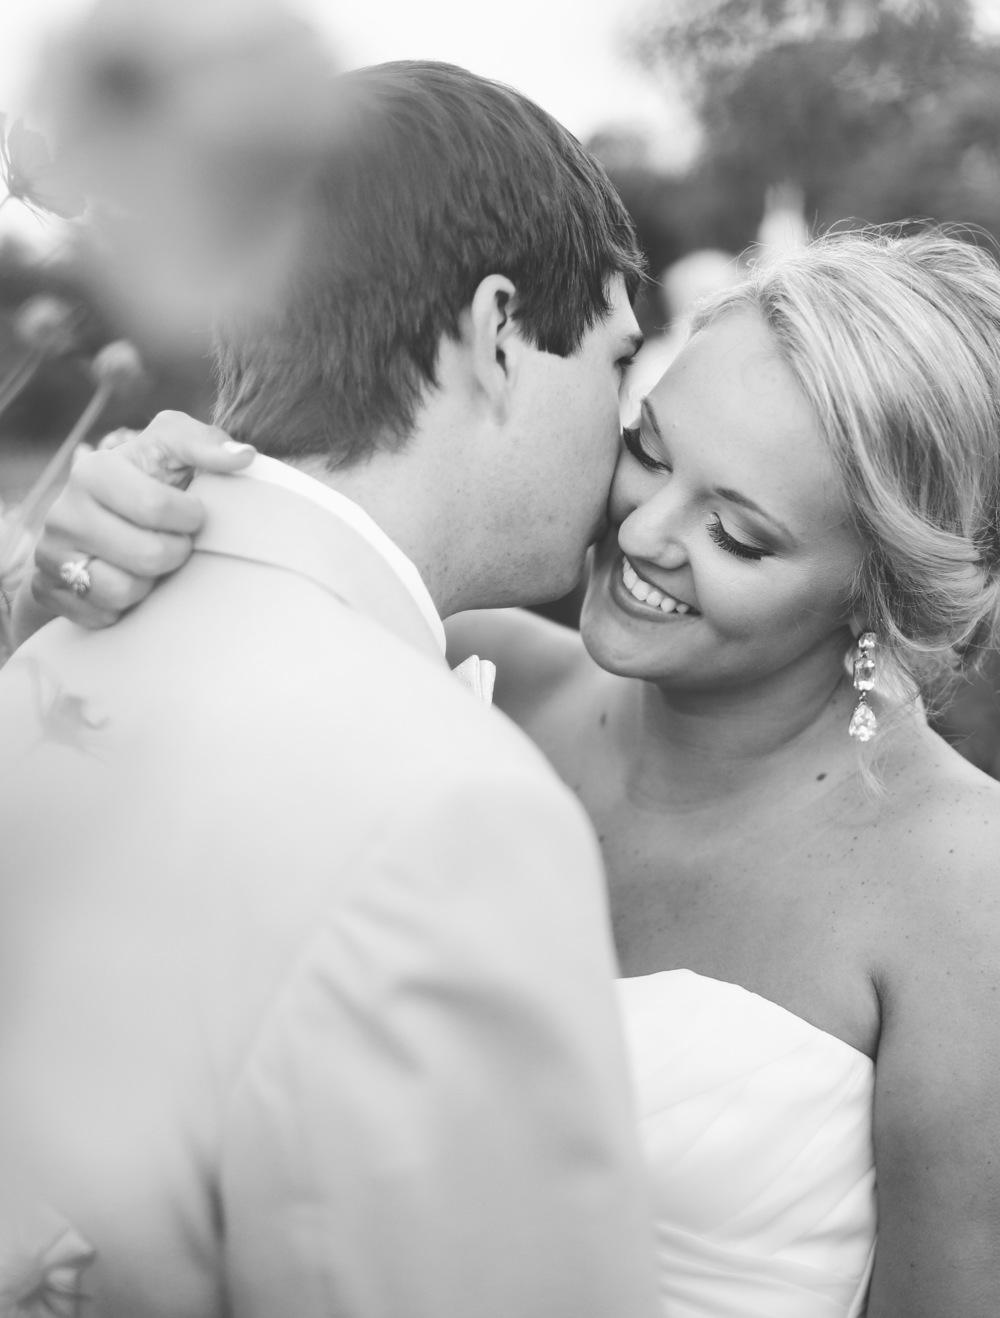 Classy wedding at Moore's Springs Manor, by Jordan Brannock Photography